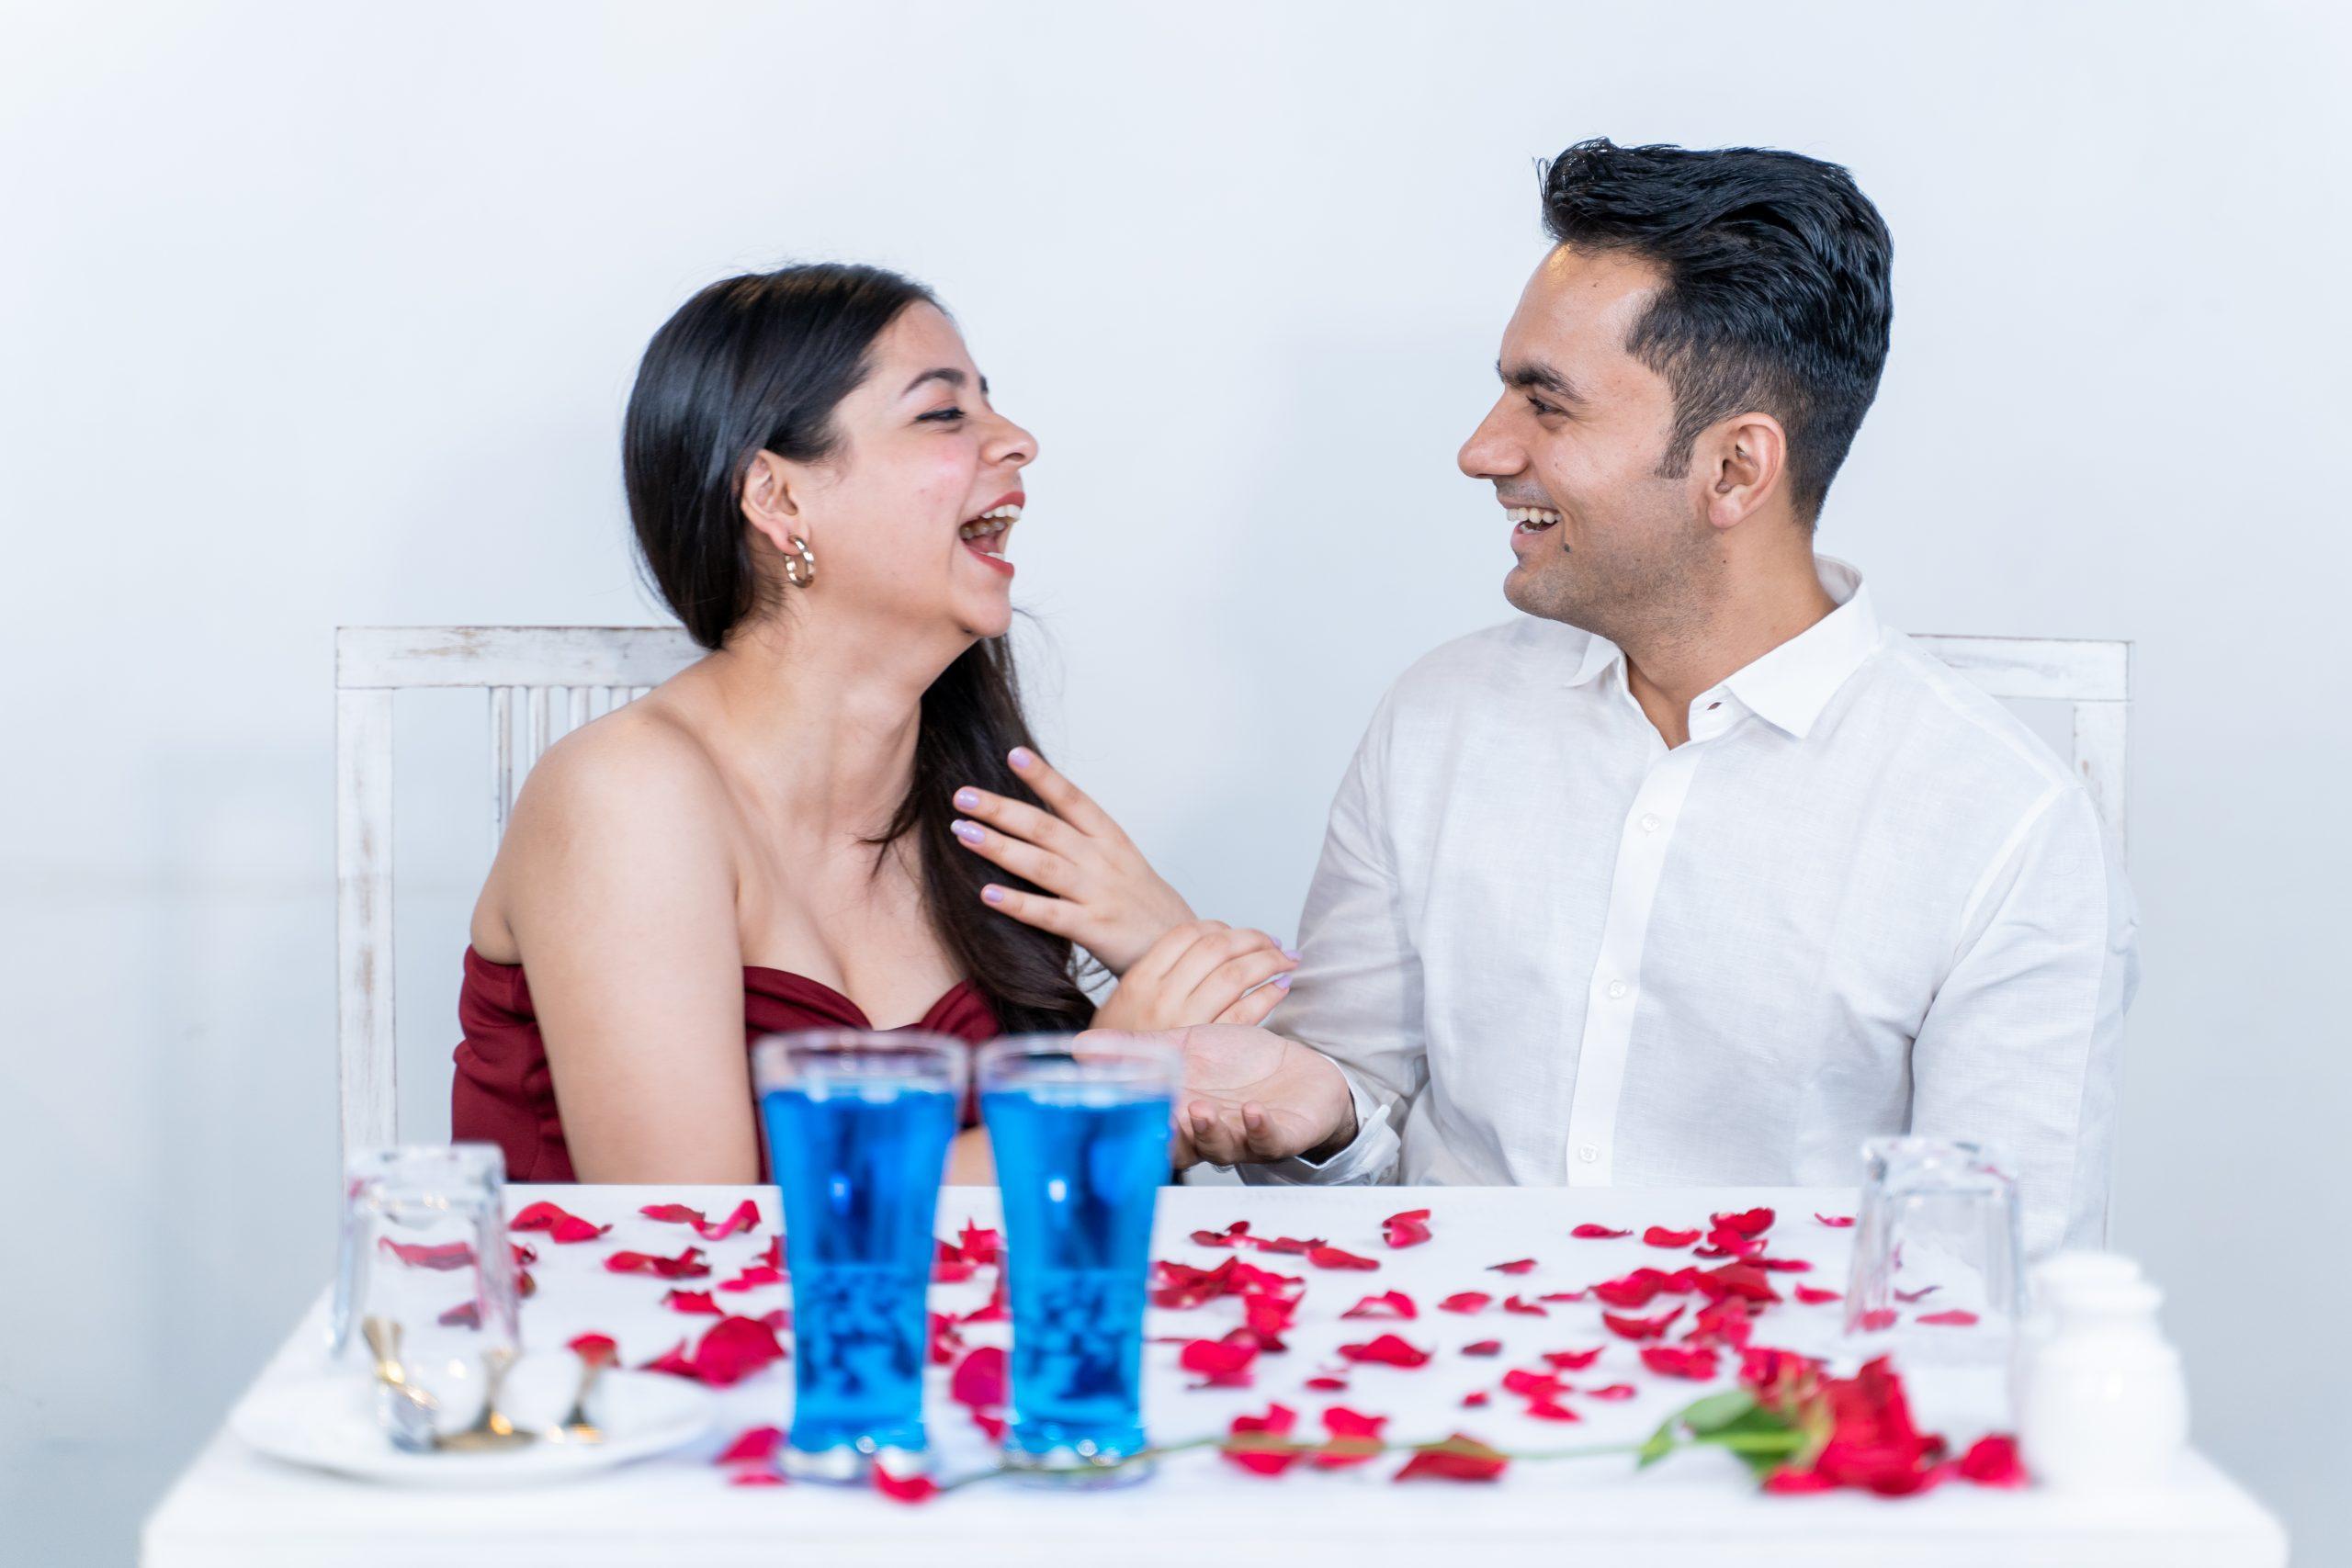 Couple enjoying their date